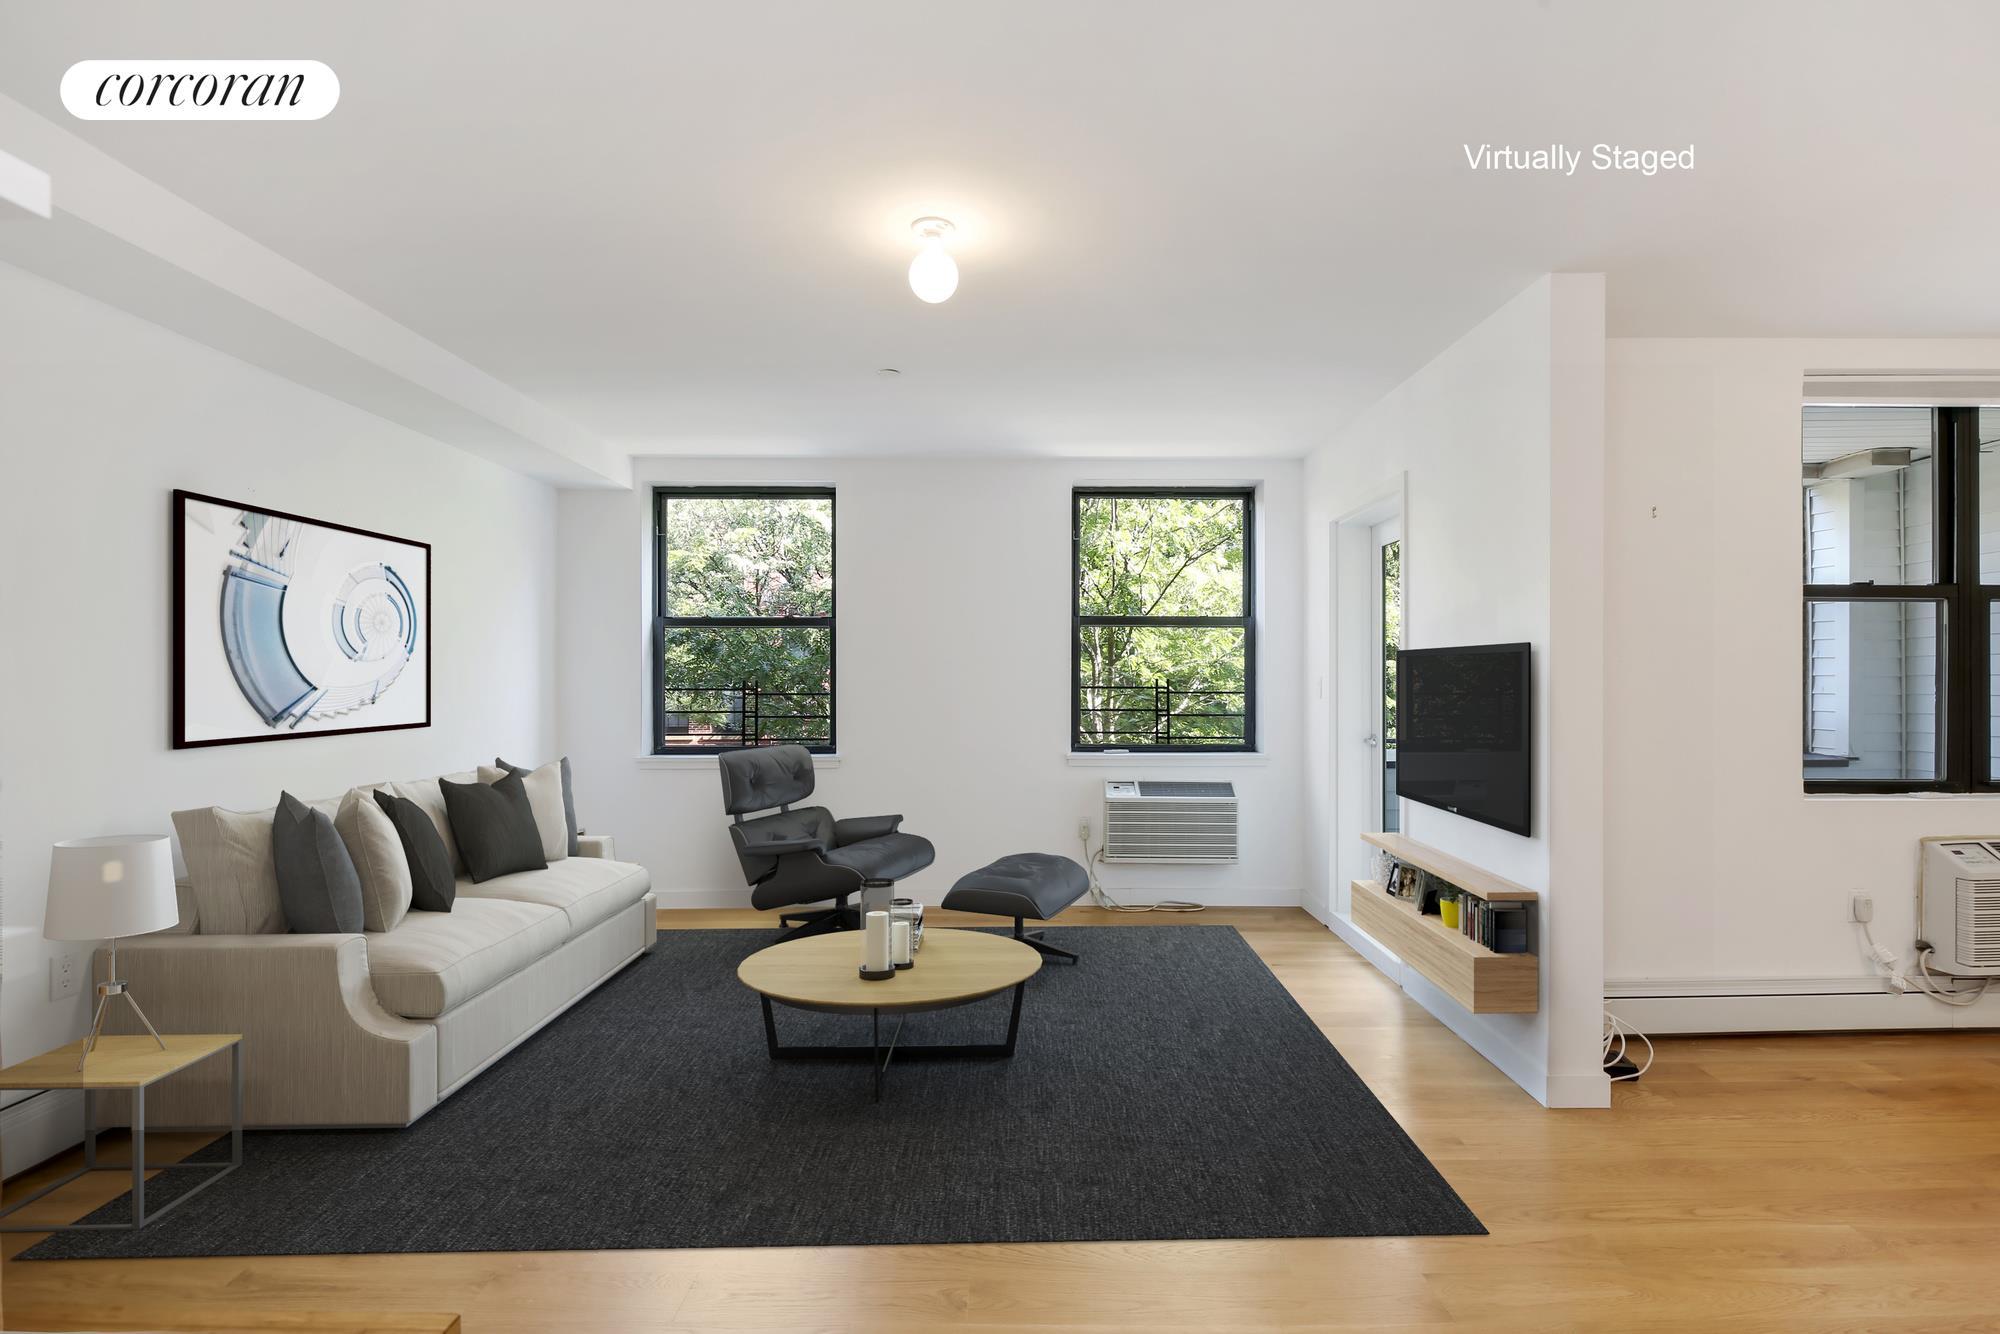 Corcoran, 714 Sackett Street, Apt. 2F, Park Slope Real Estate ...